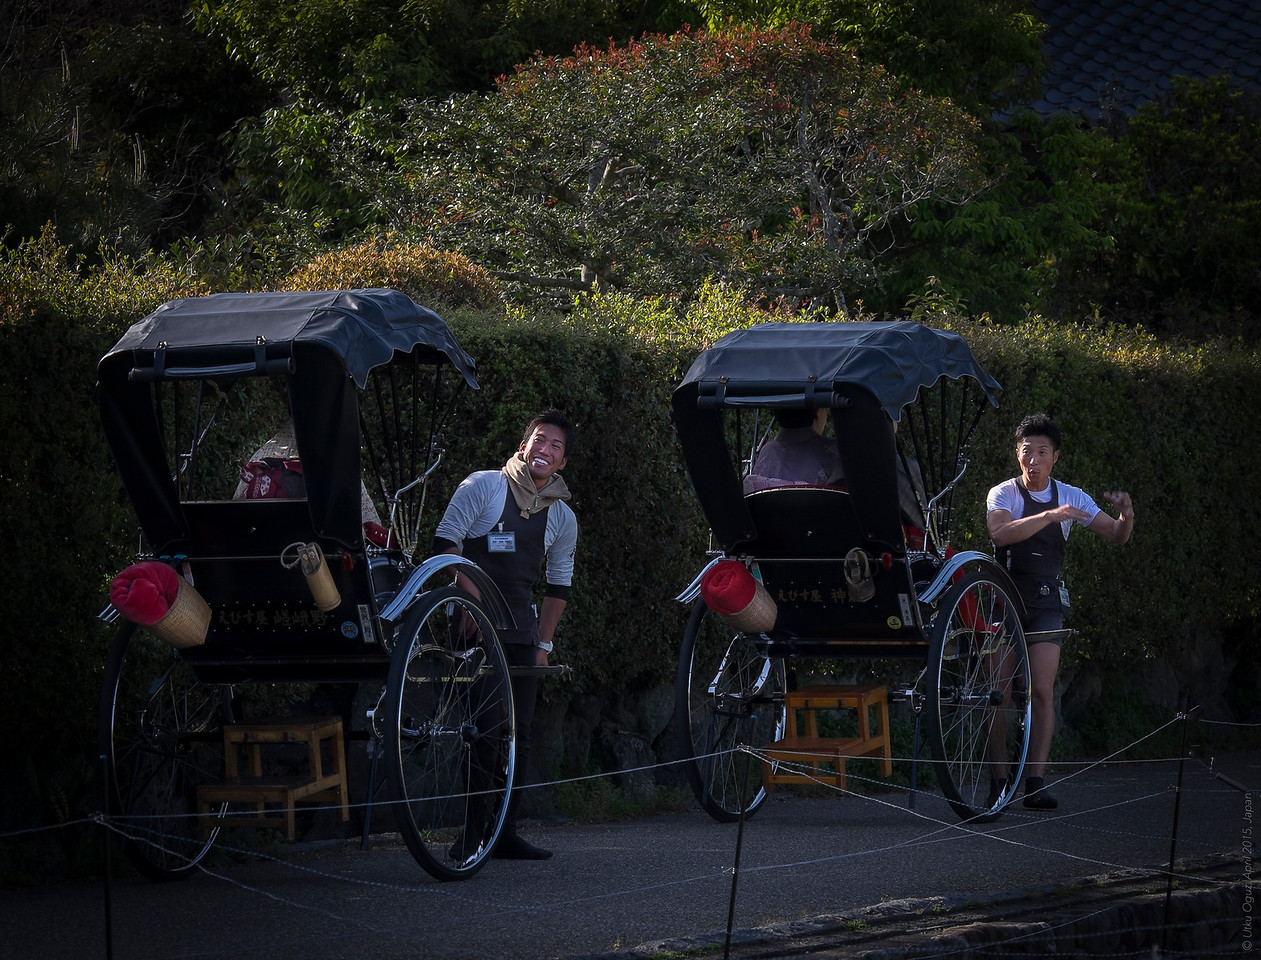 Fun-Ride by Rickshaw Riders...